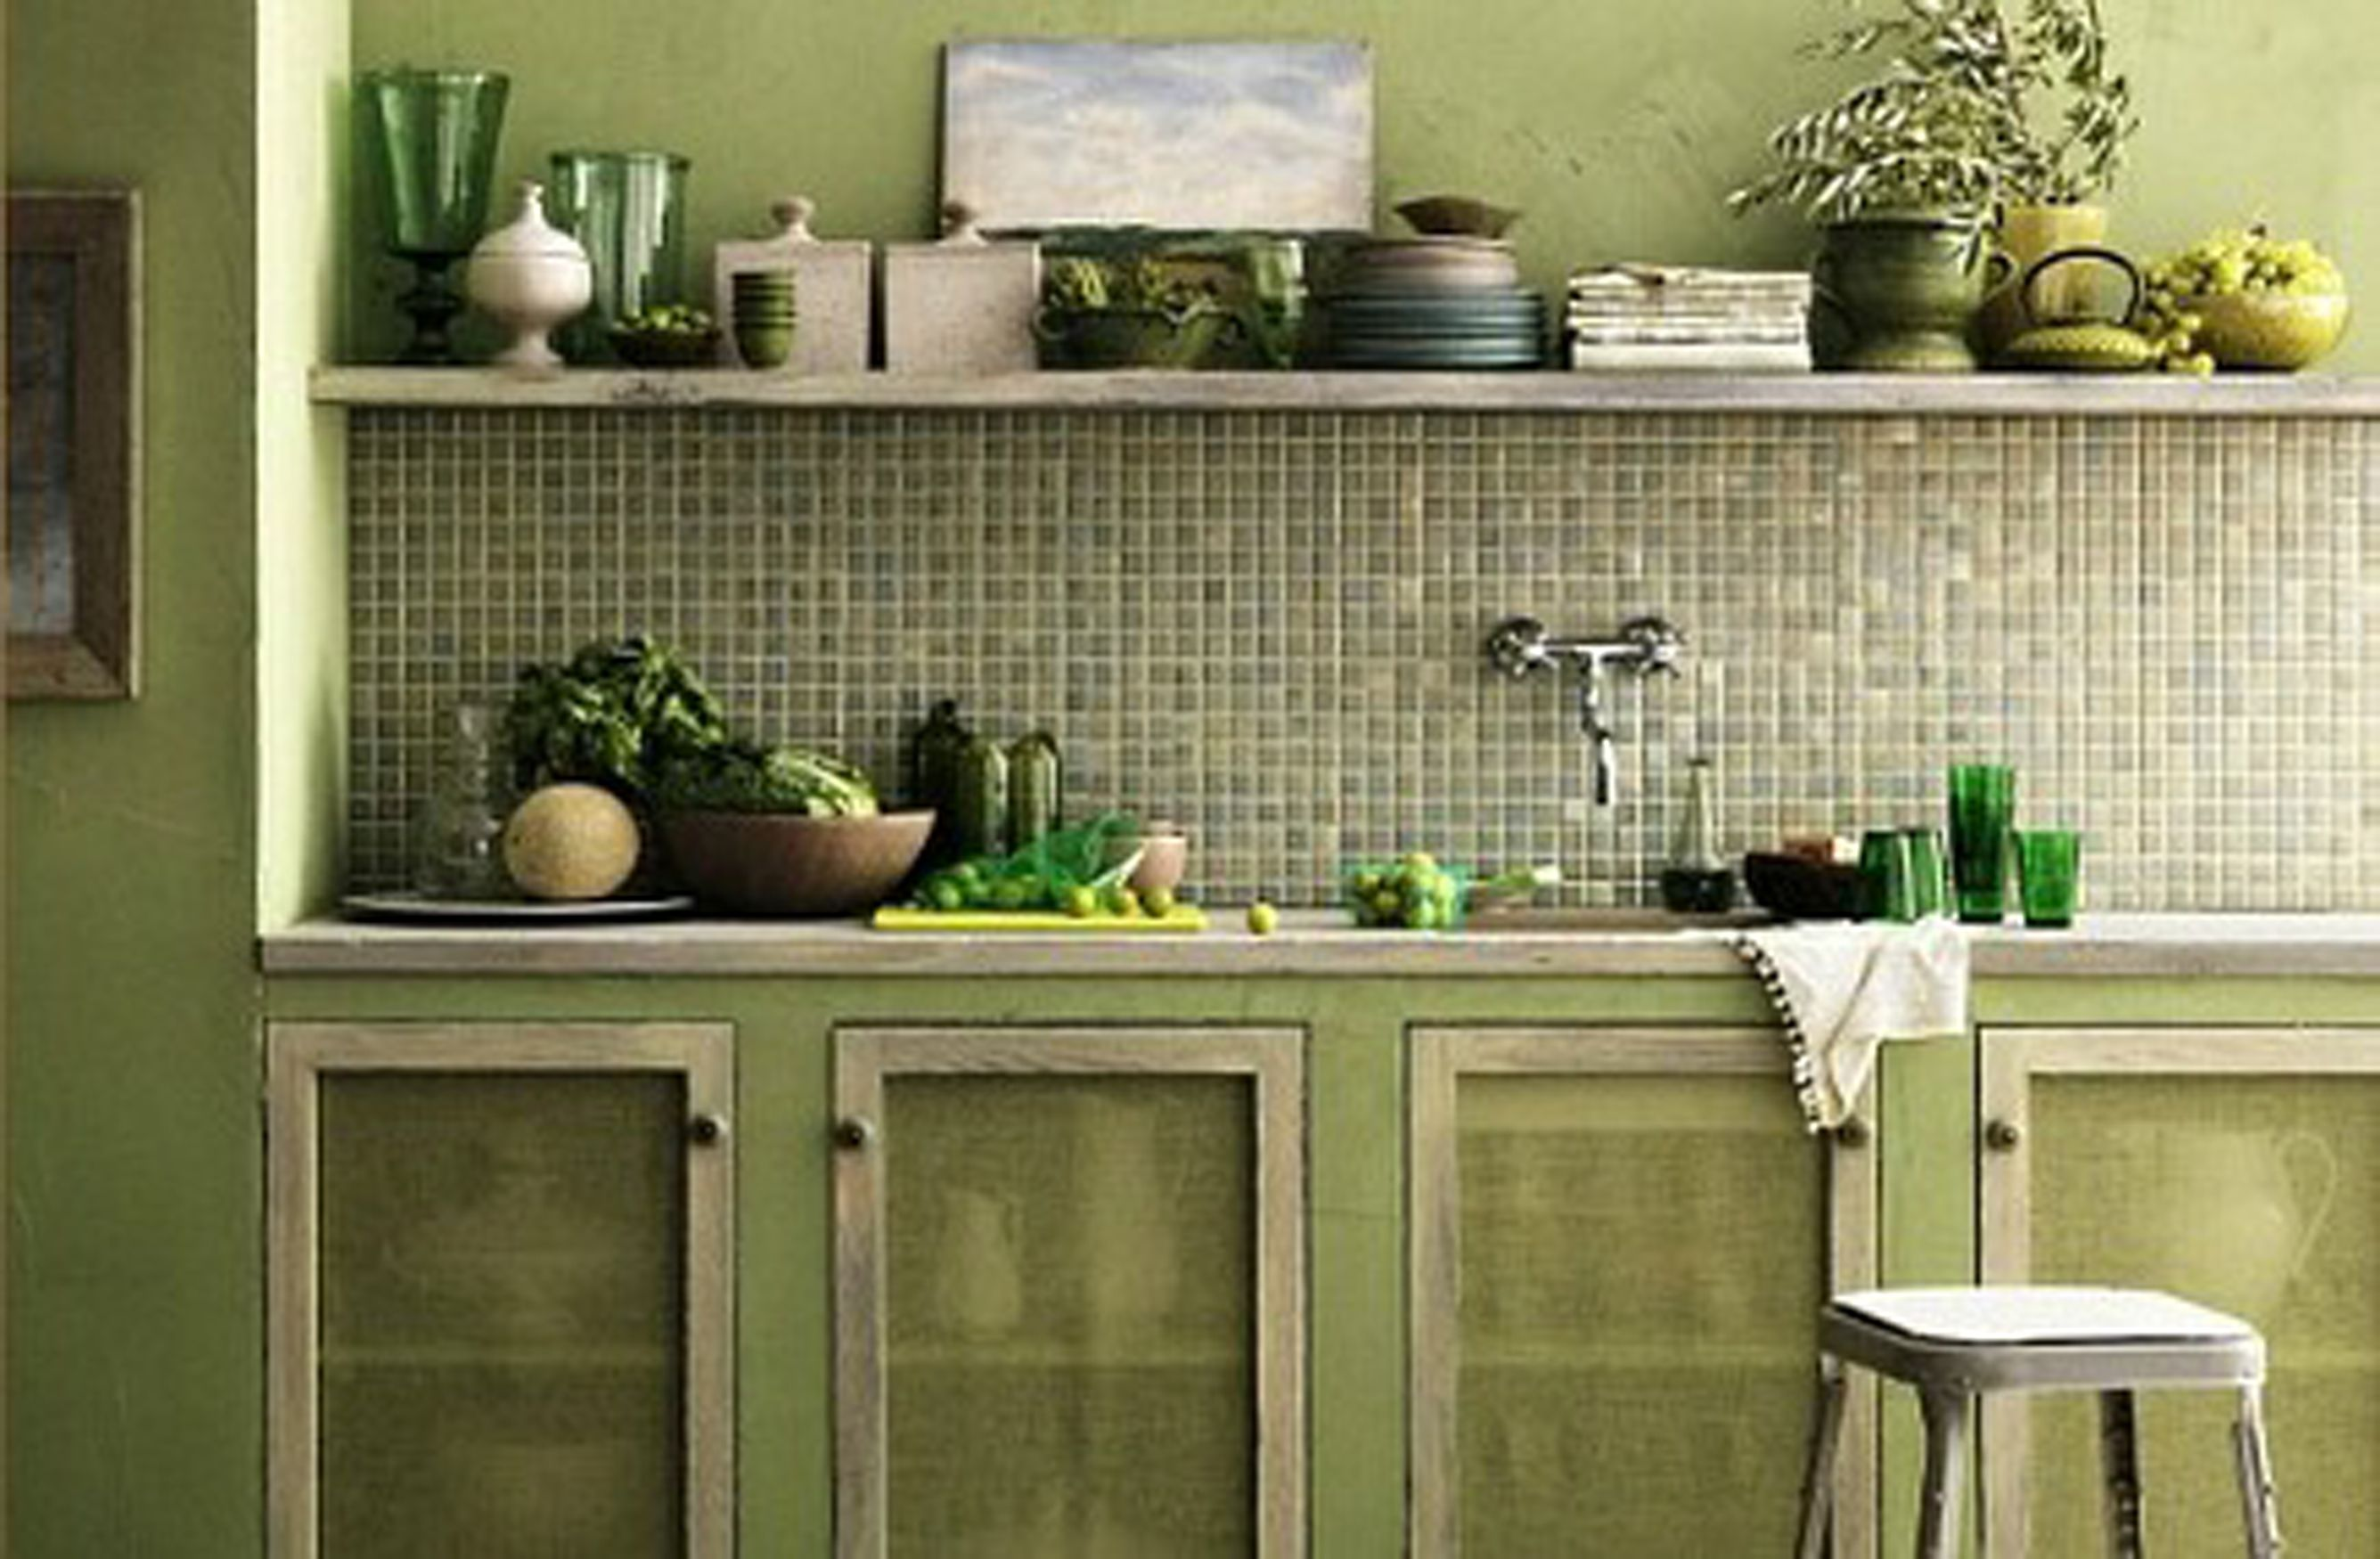 Monochromatic Green   Green kitchen cabinets, Green kitchen, Olive ...